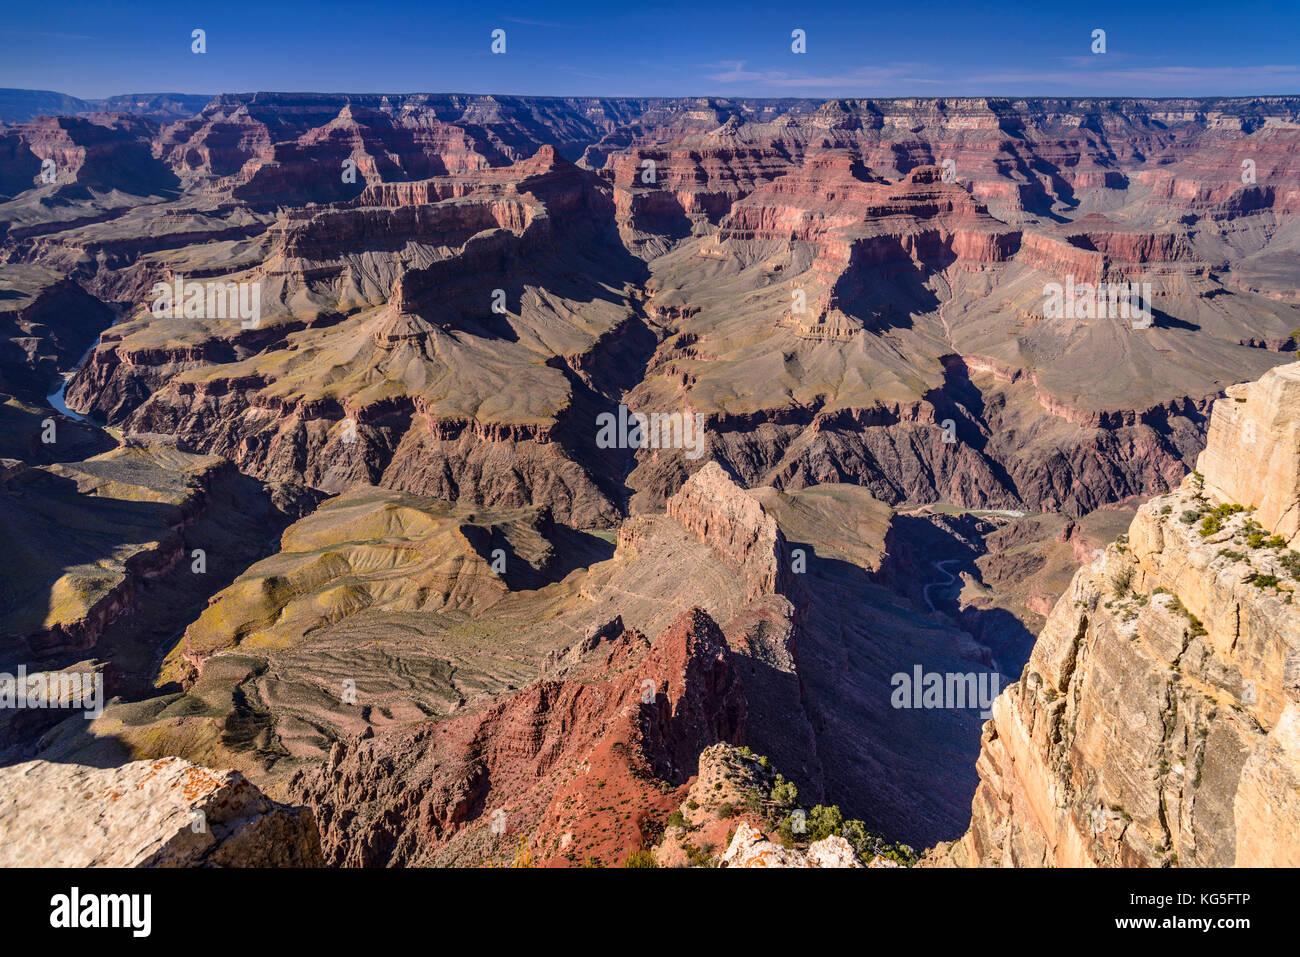 The USA, Arizona, Grand canyon National Park, South Rim, Pima Point - Stock Image